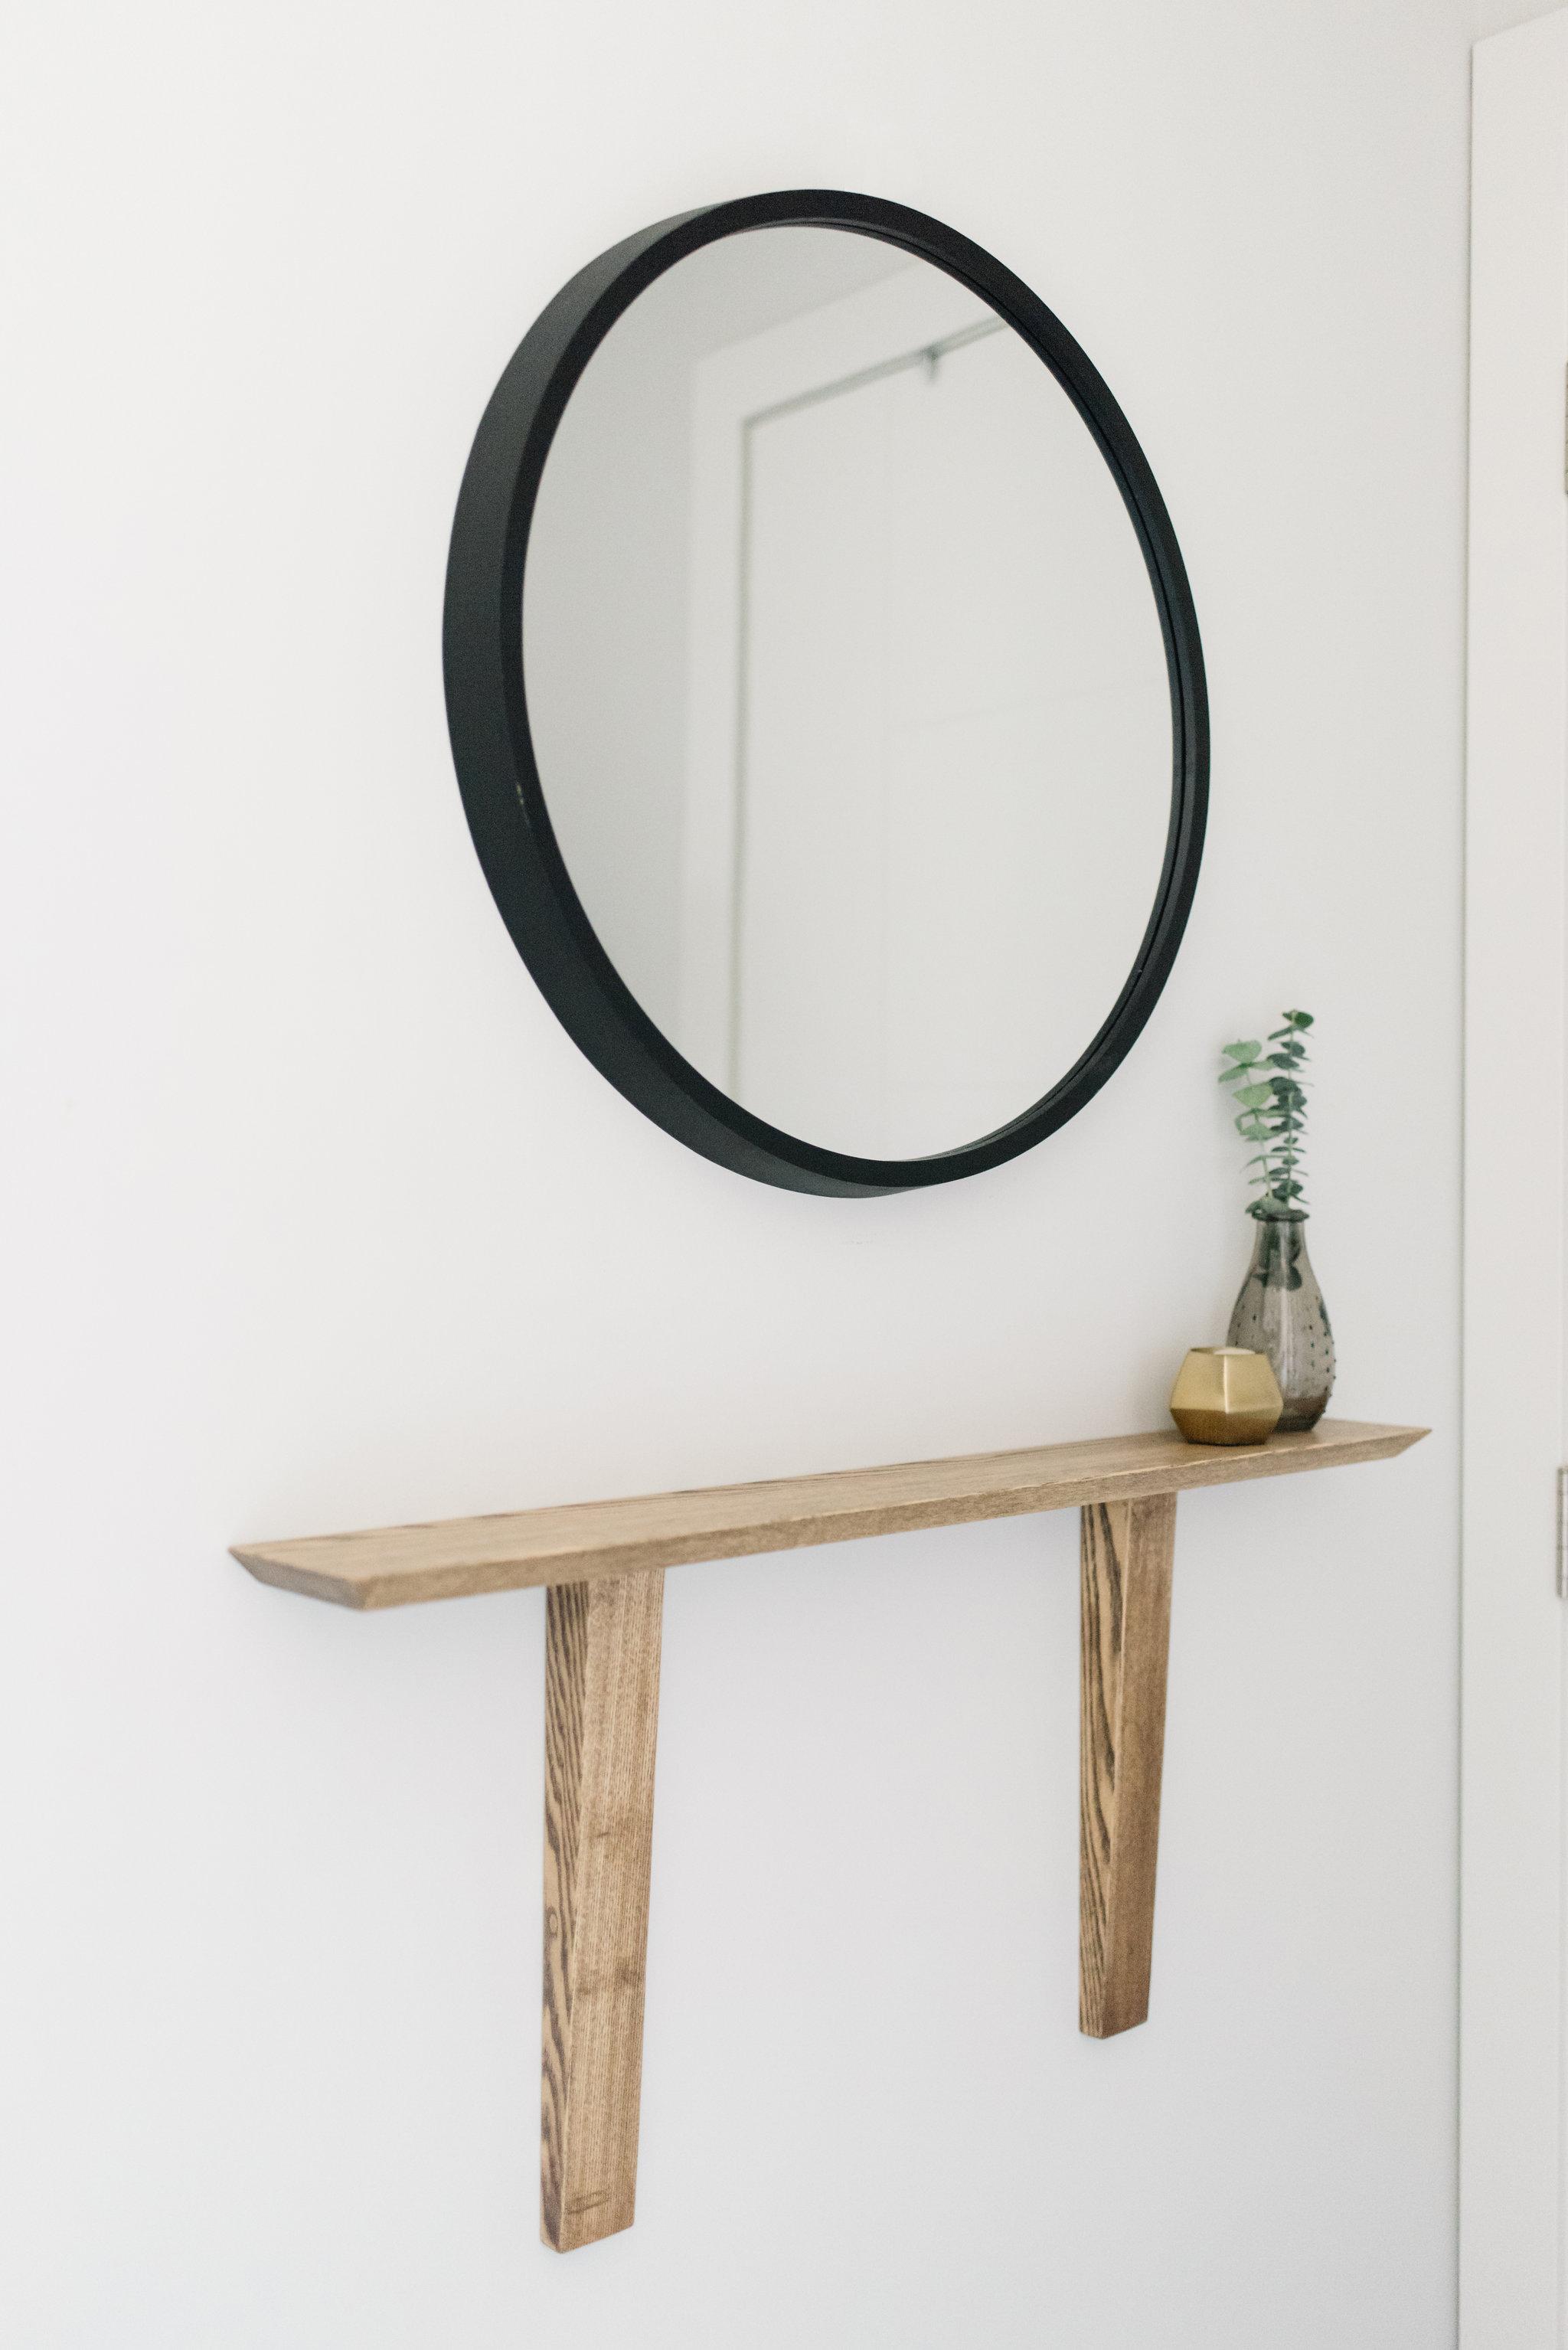 round mirror and small ledge shelf